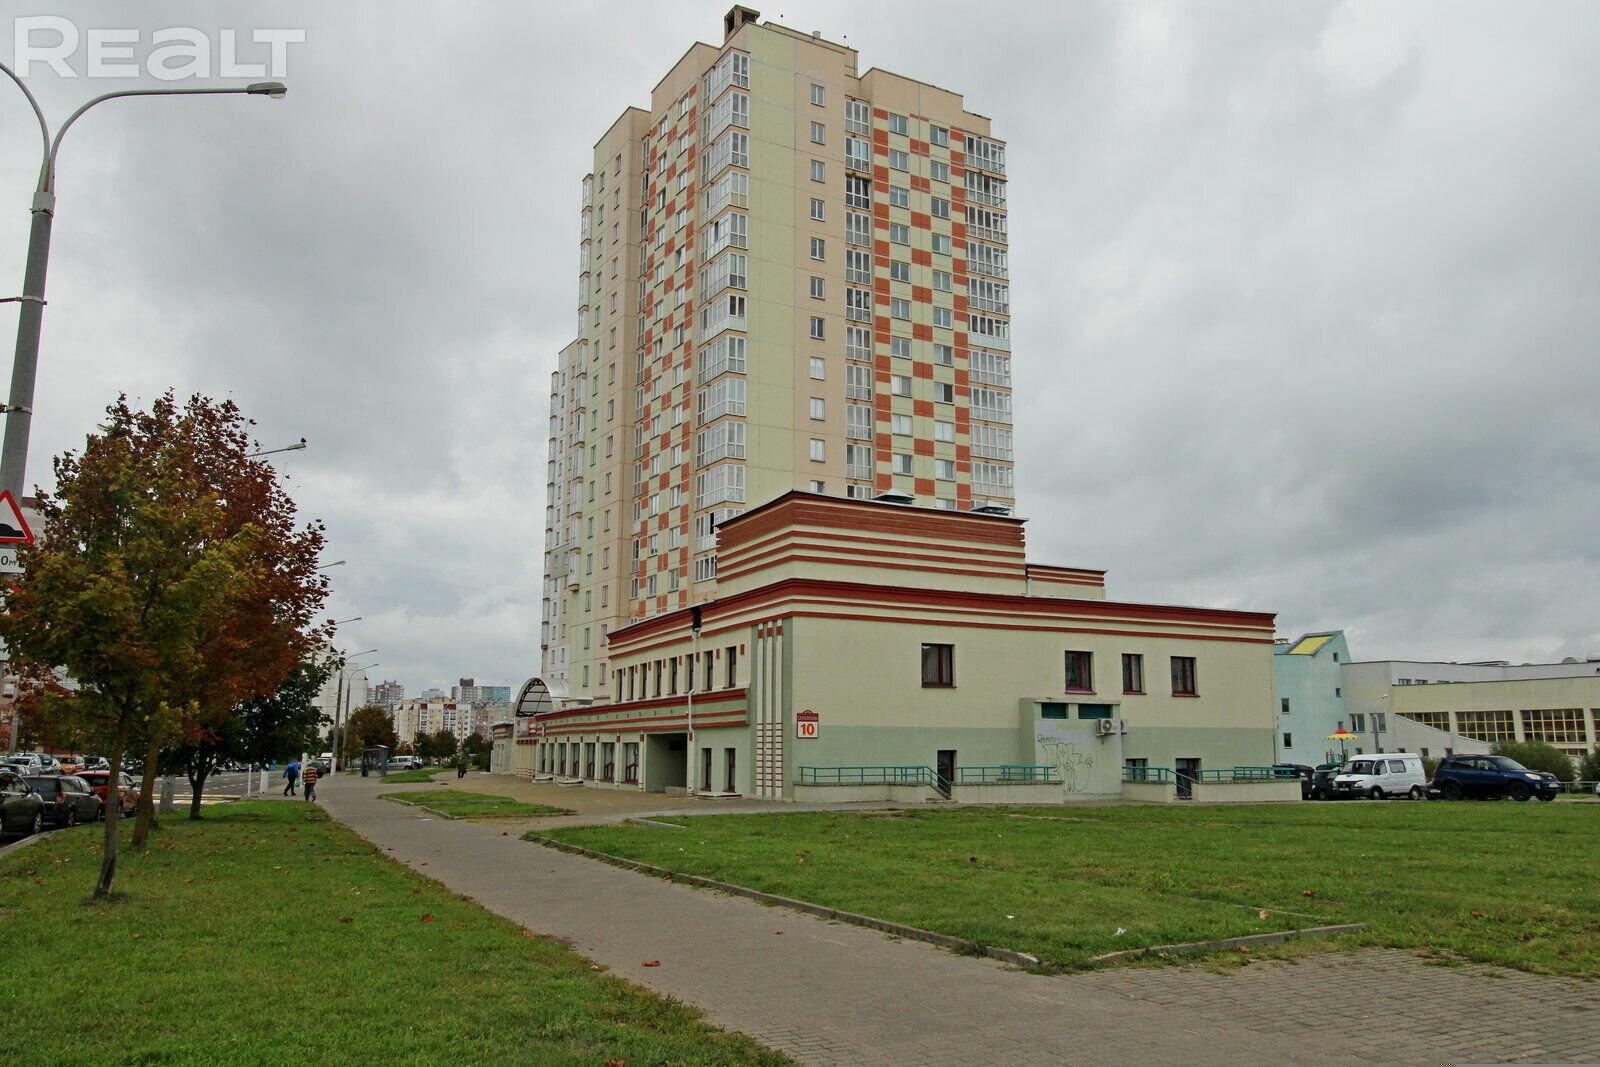 Продажа 2-х комнатной квартиры в г. Минске, ул. Скрипникова, дом 10 (р-н Сухарево). Цена 185 972 руб c торгом